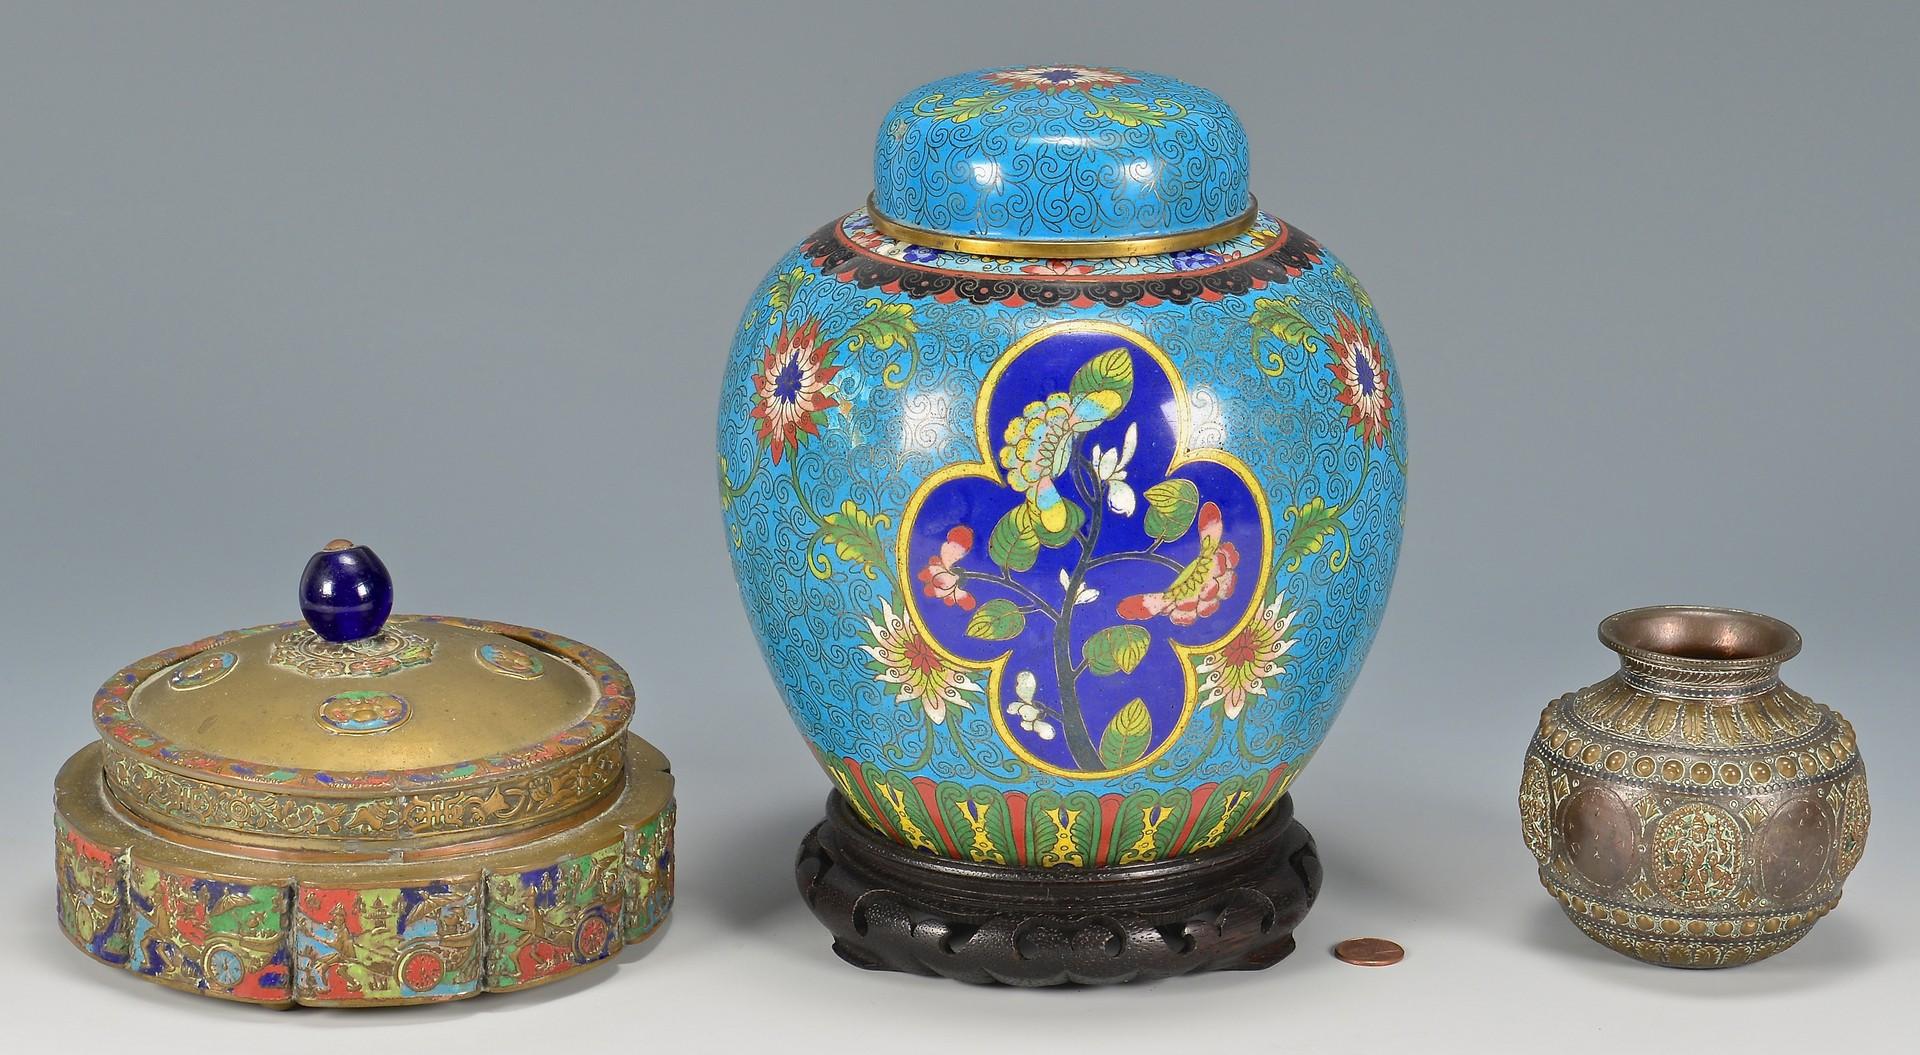 Lot 405: 3 Asian Metal Decorative Items